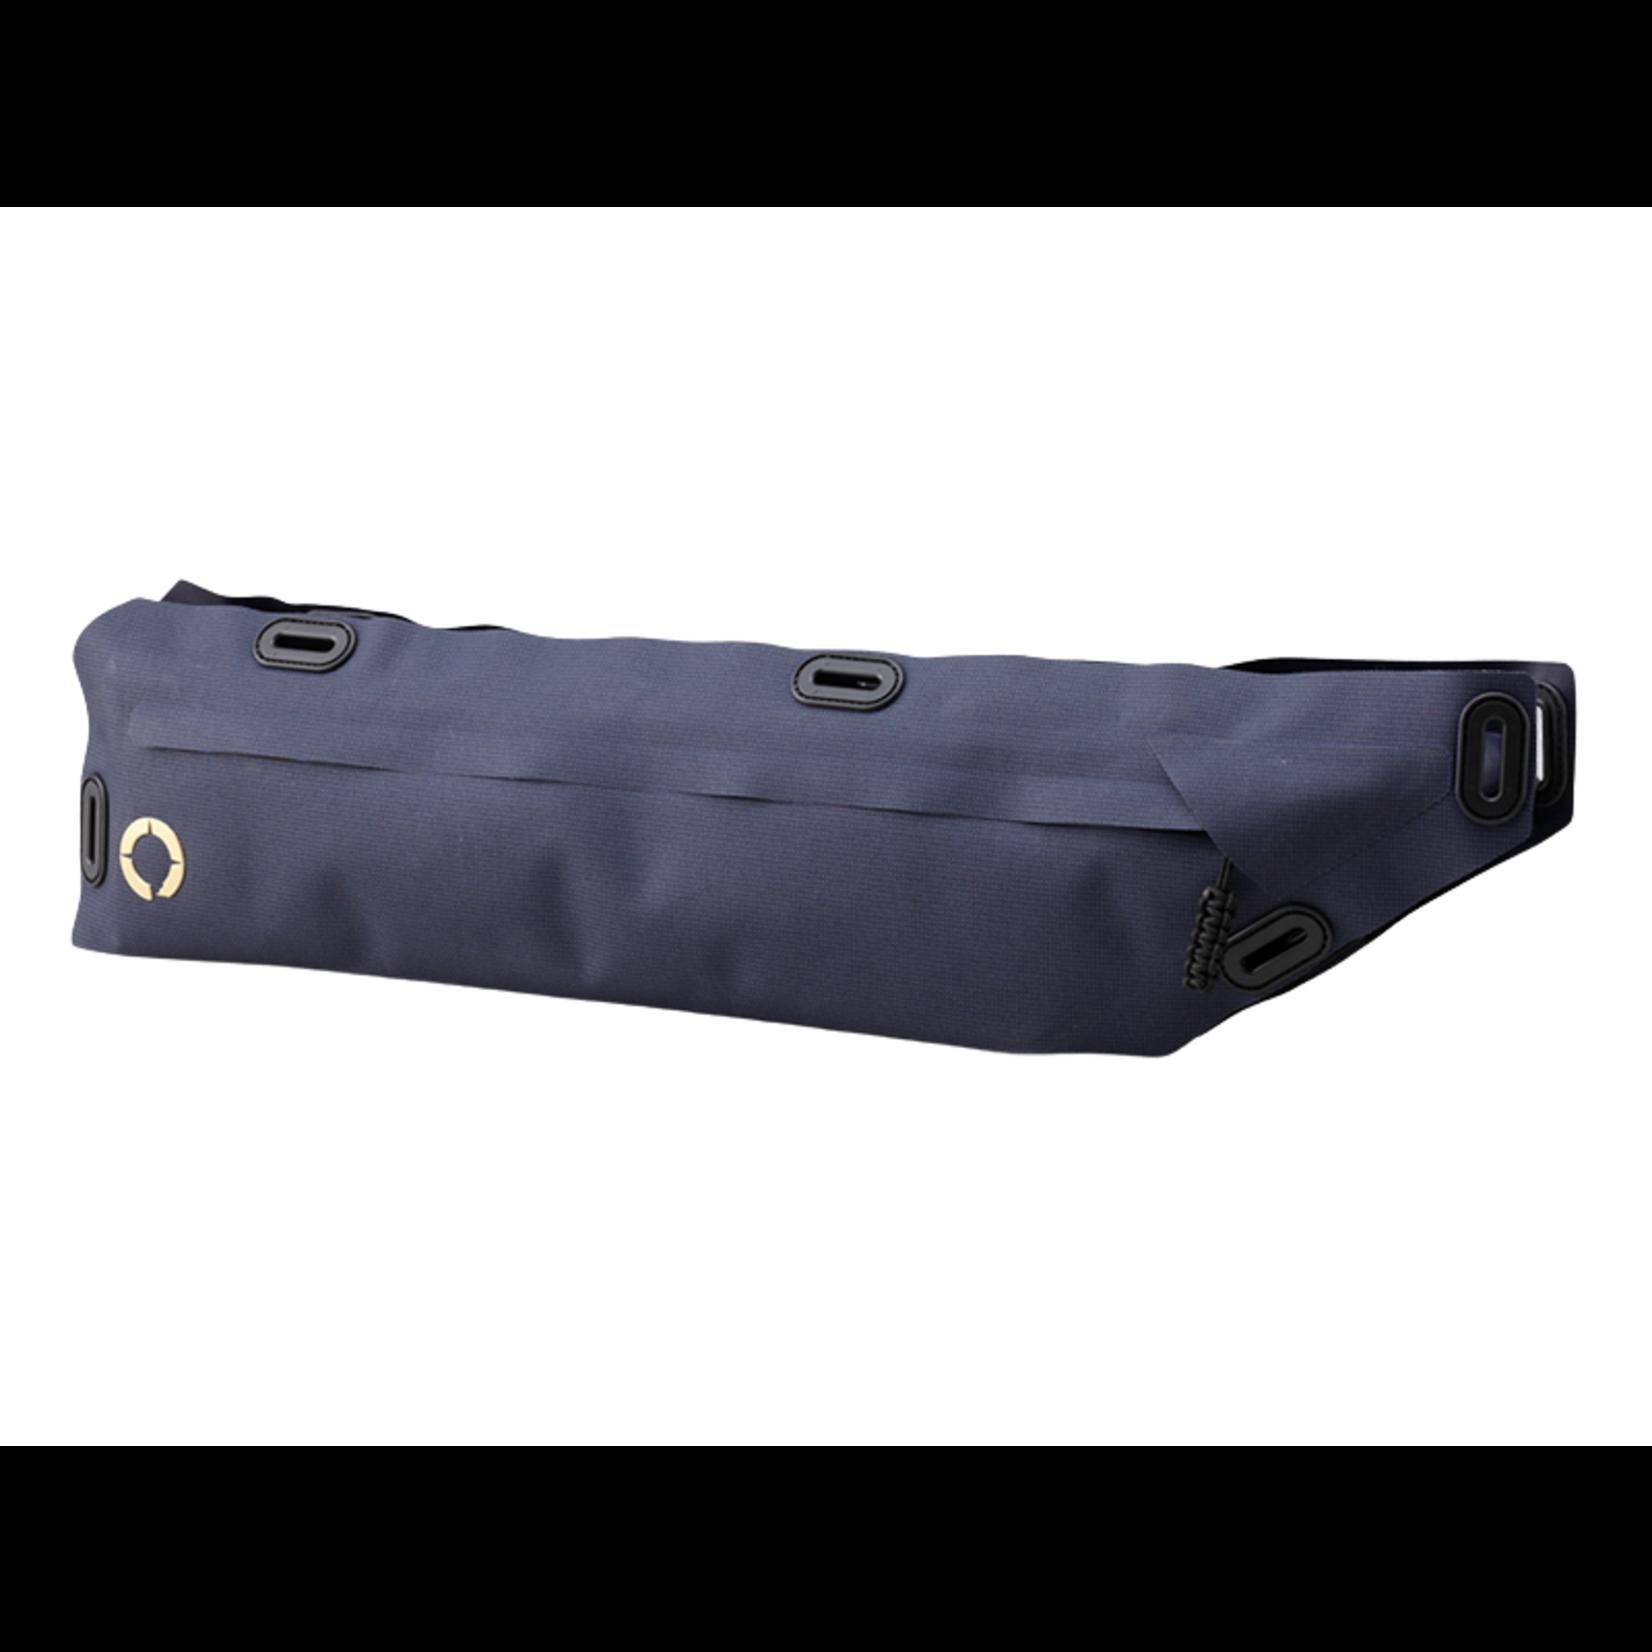 Roswheel Roswheel Off-Road Frame Bag, 2.5L